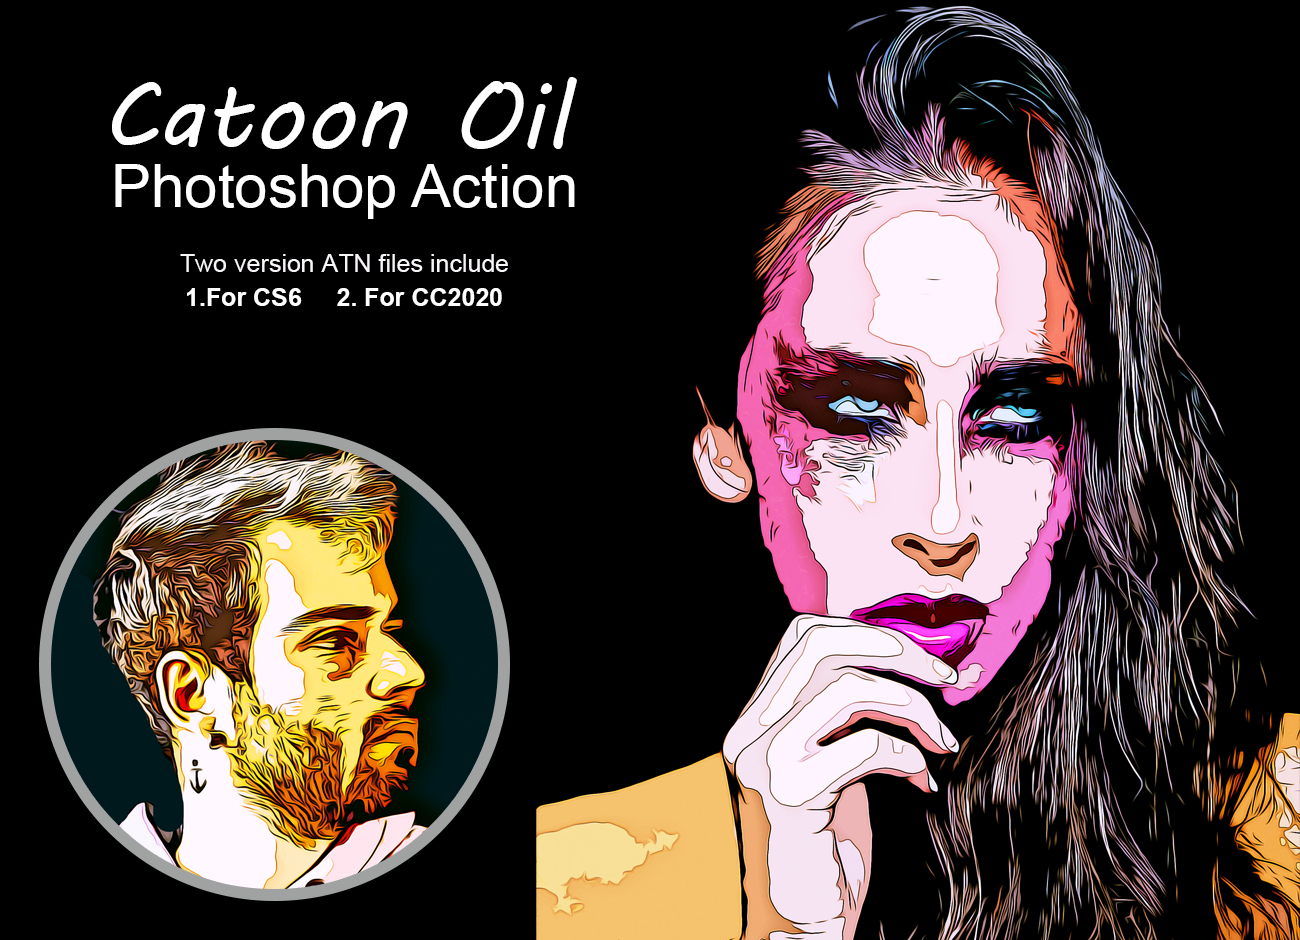 Cartoon Oil Photoshop Action Filtergrade